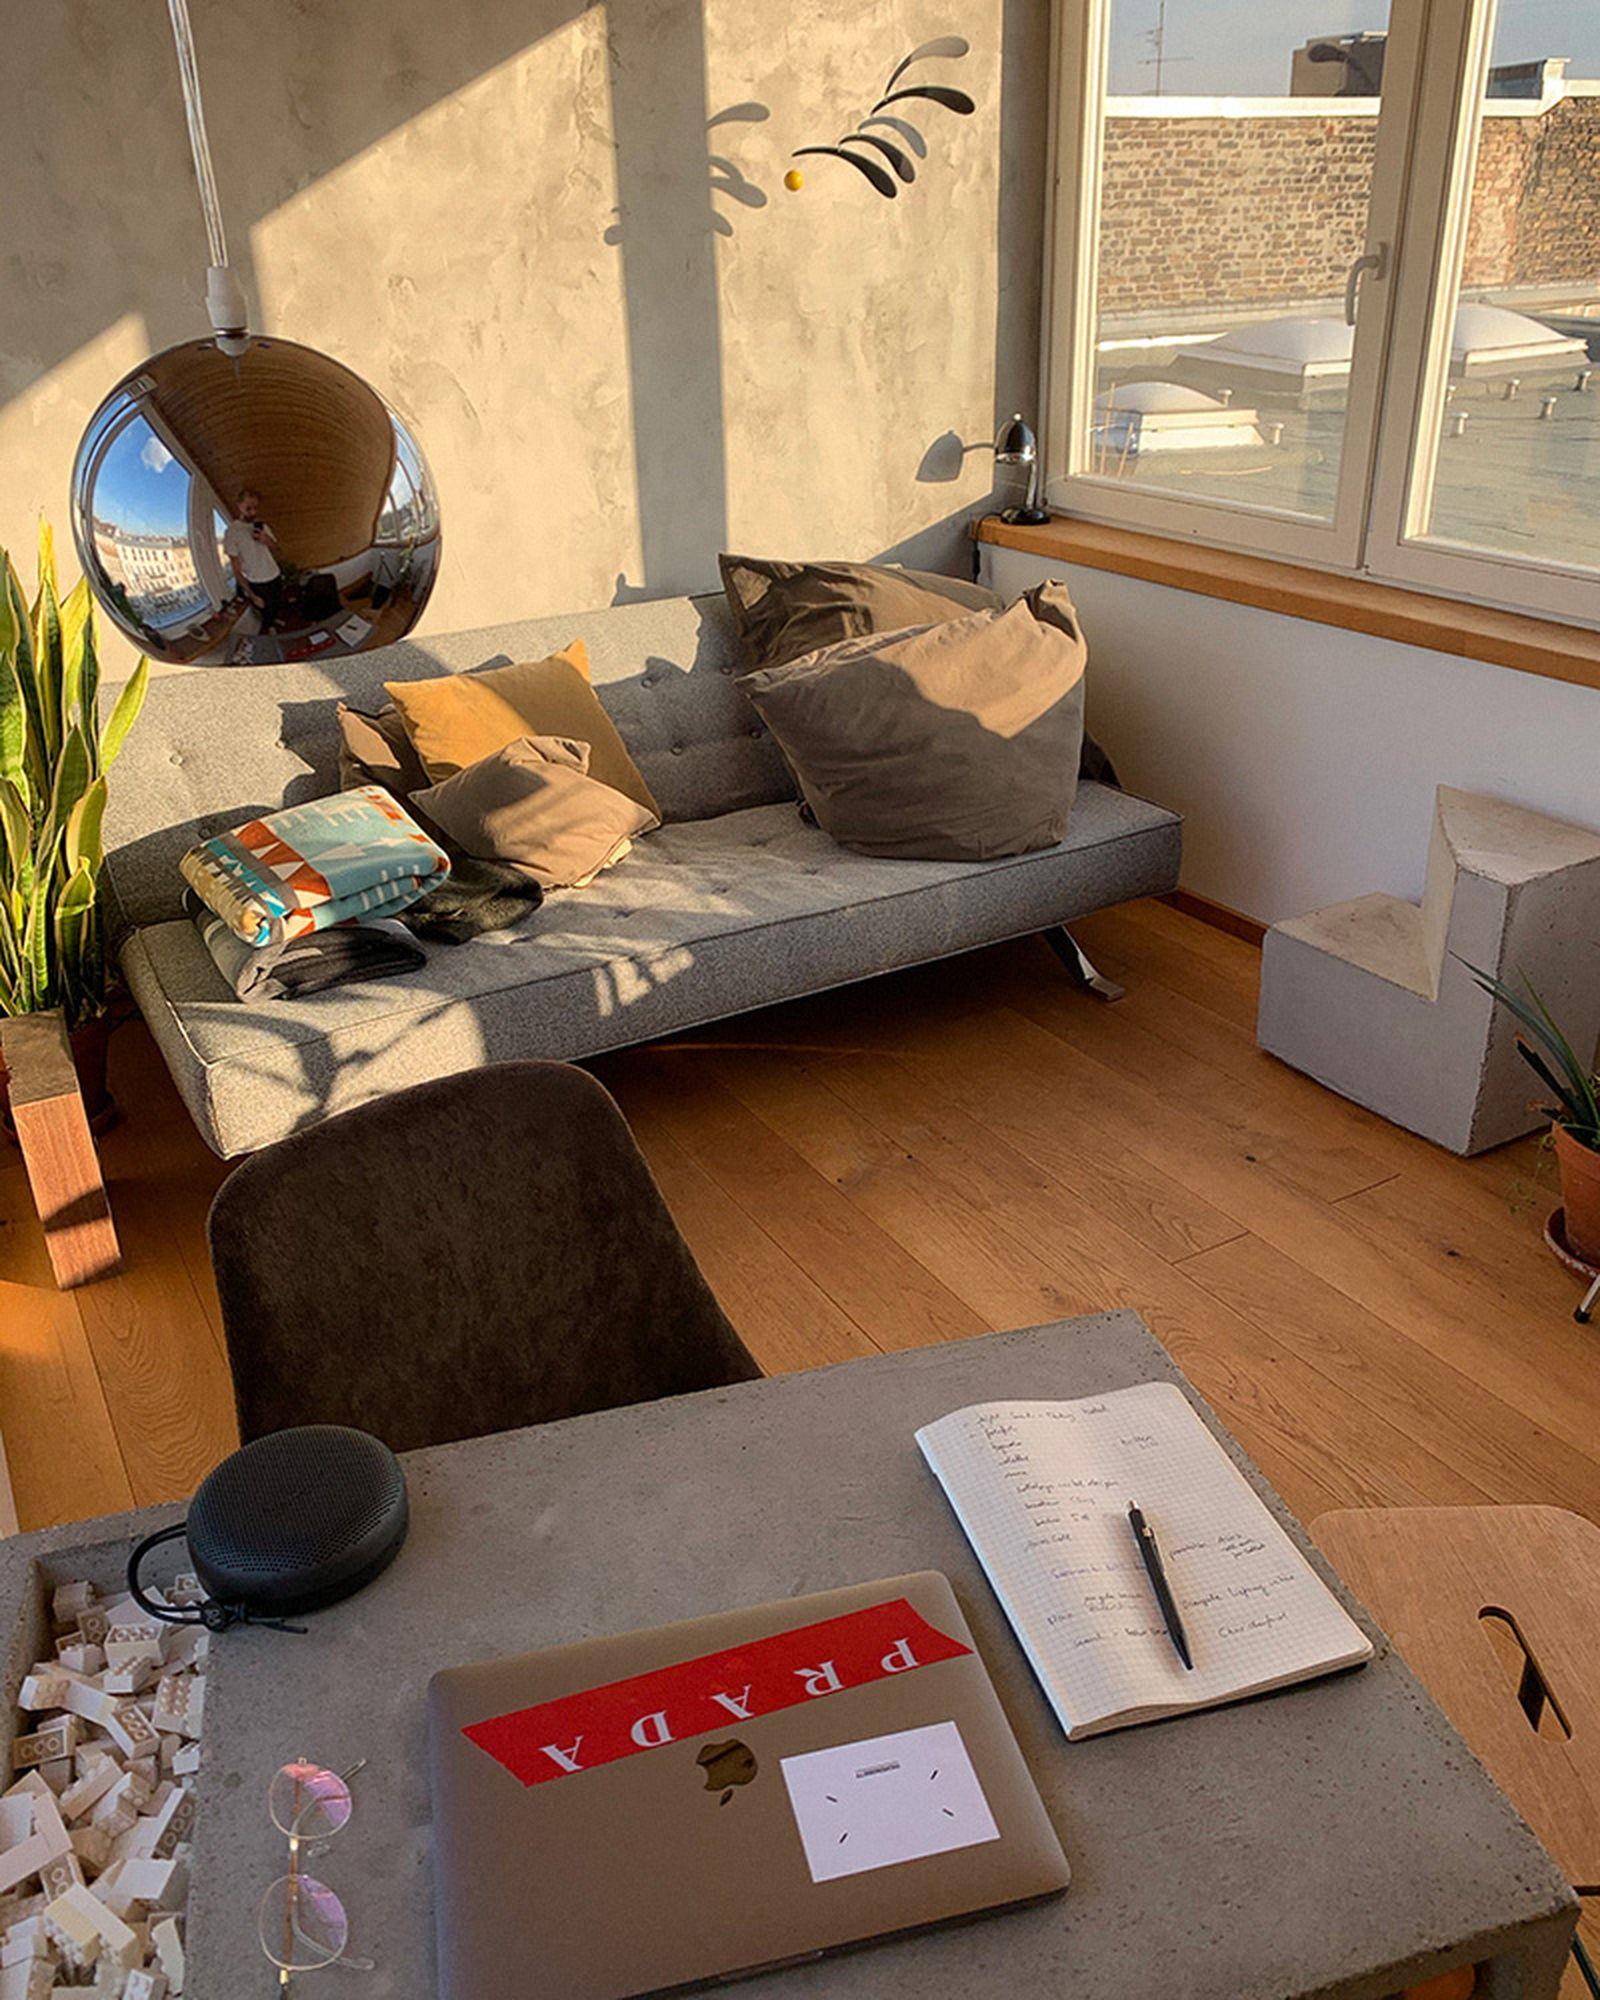 wfh-office-tour-look-inside-home-offices-herbert-03